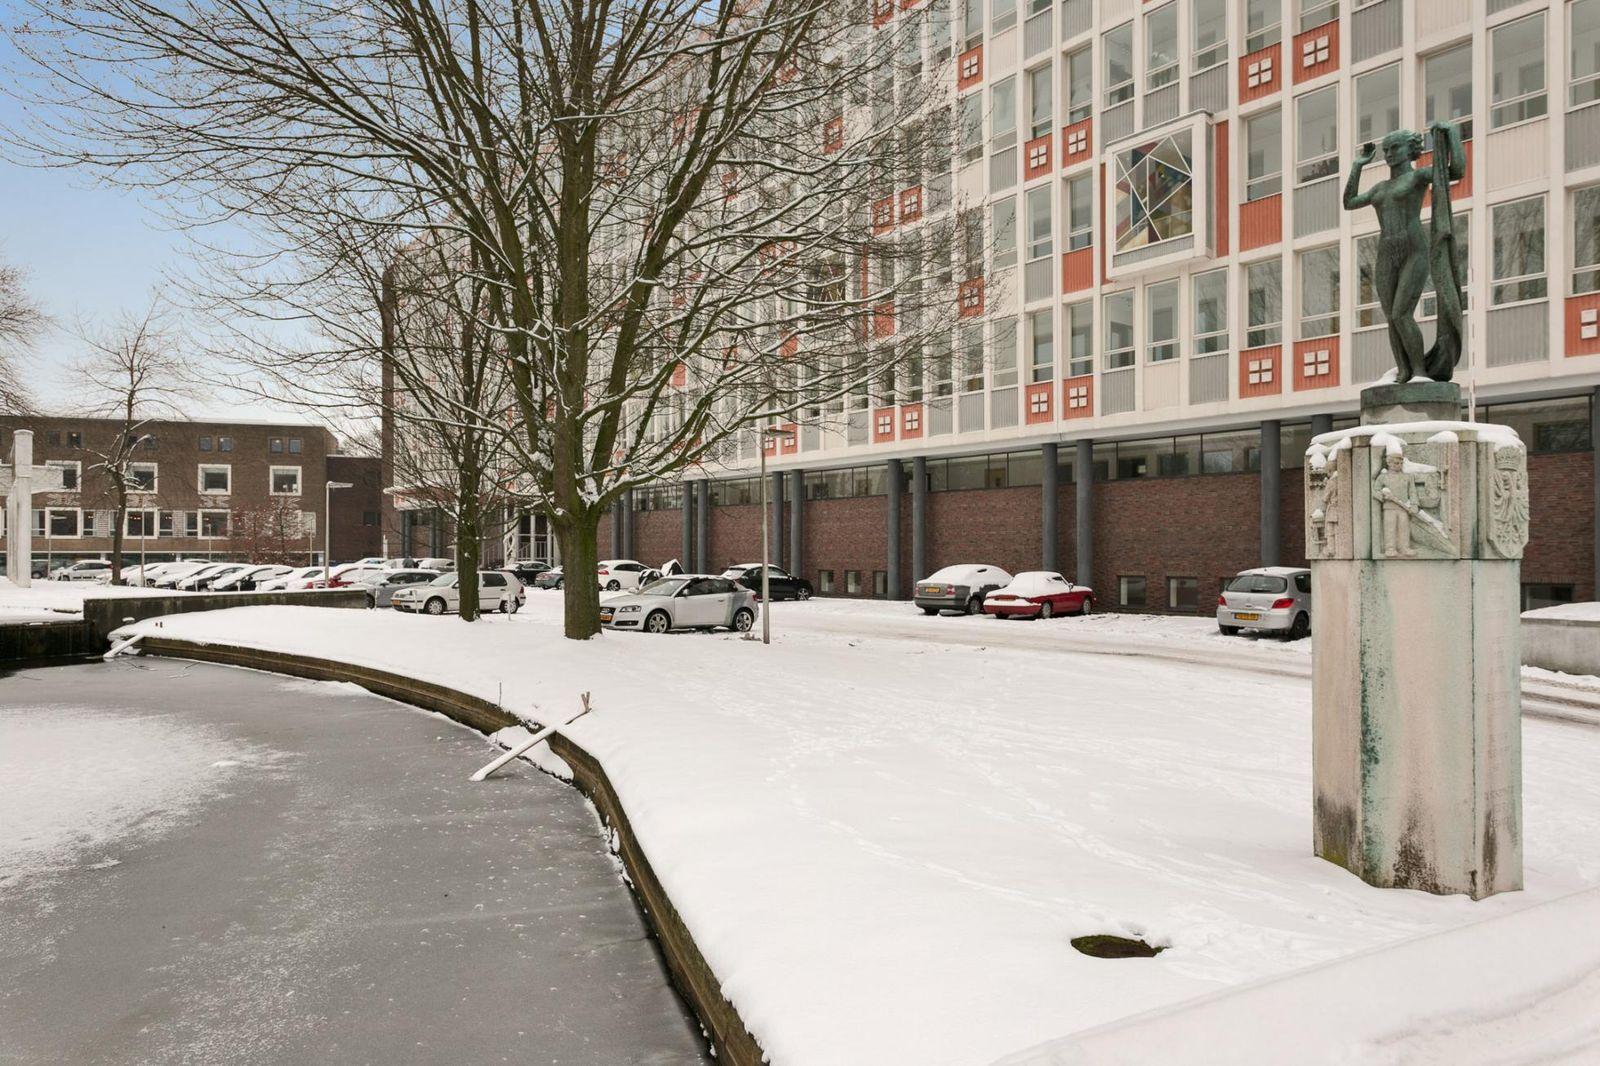 Tivolilaan 101, Arnhem